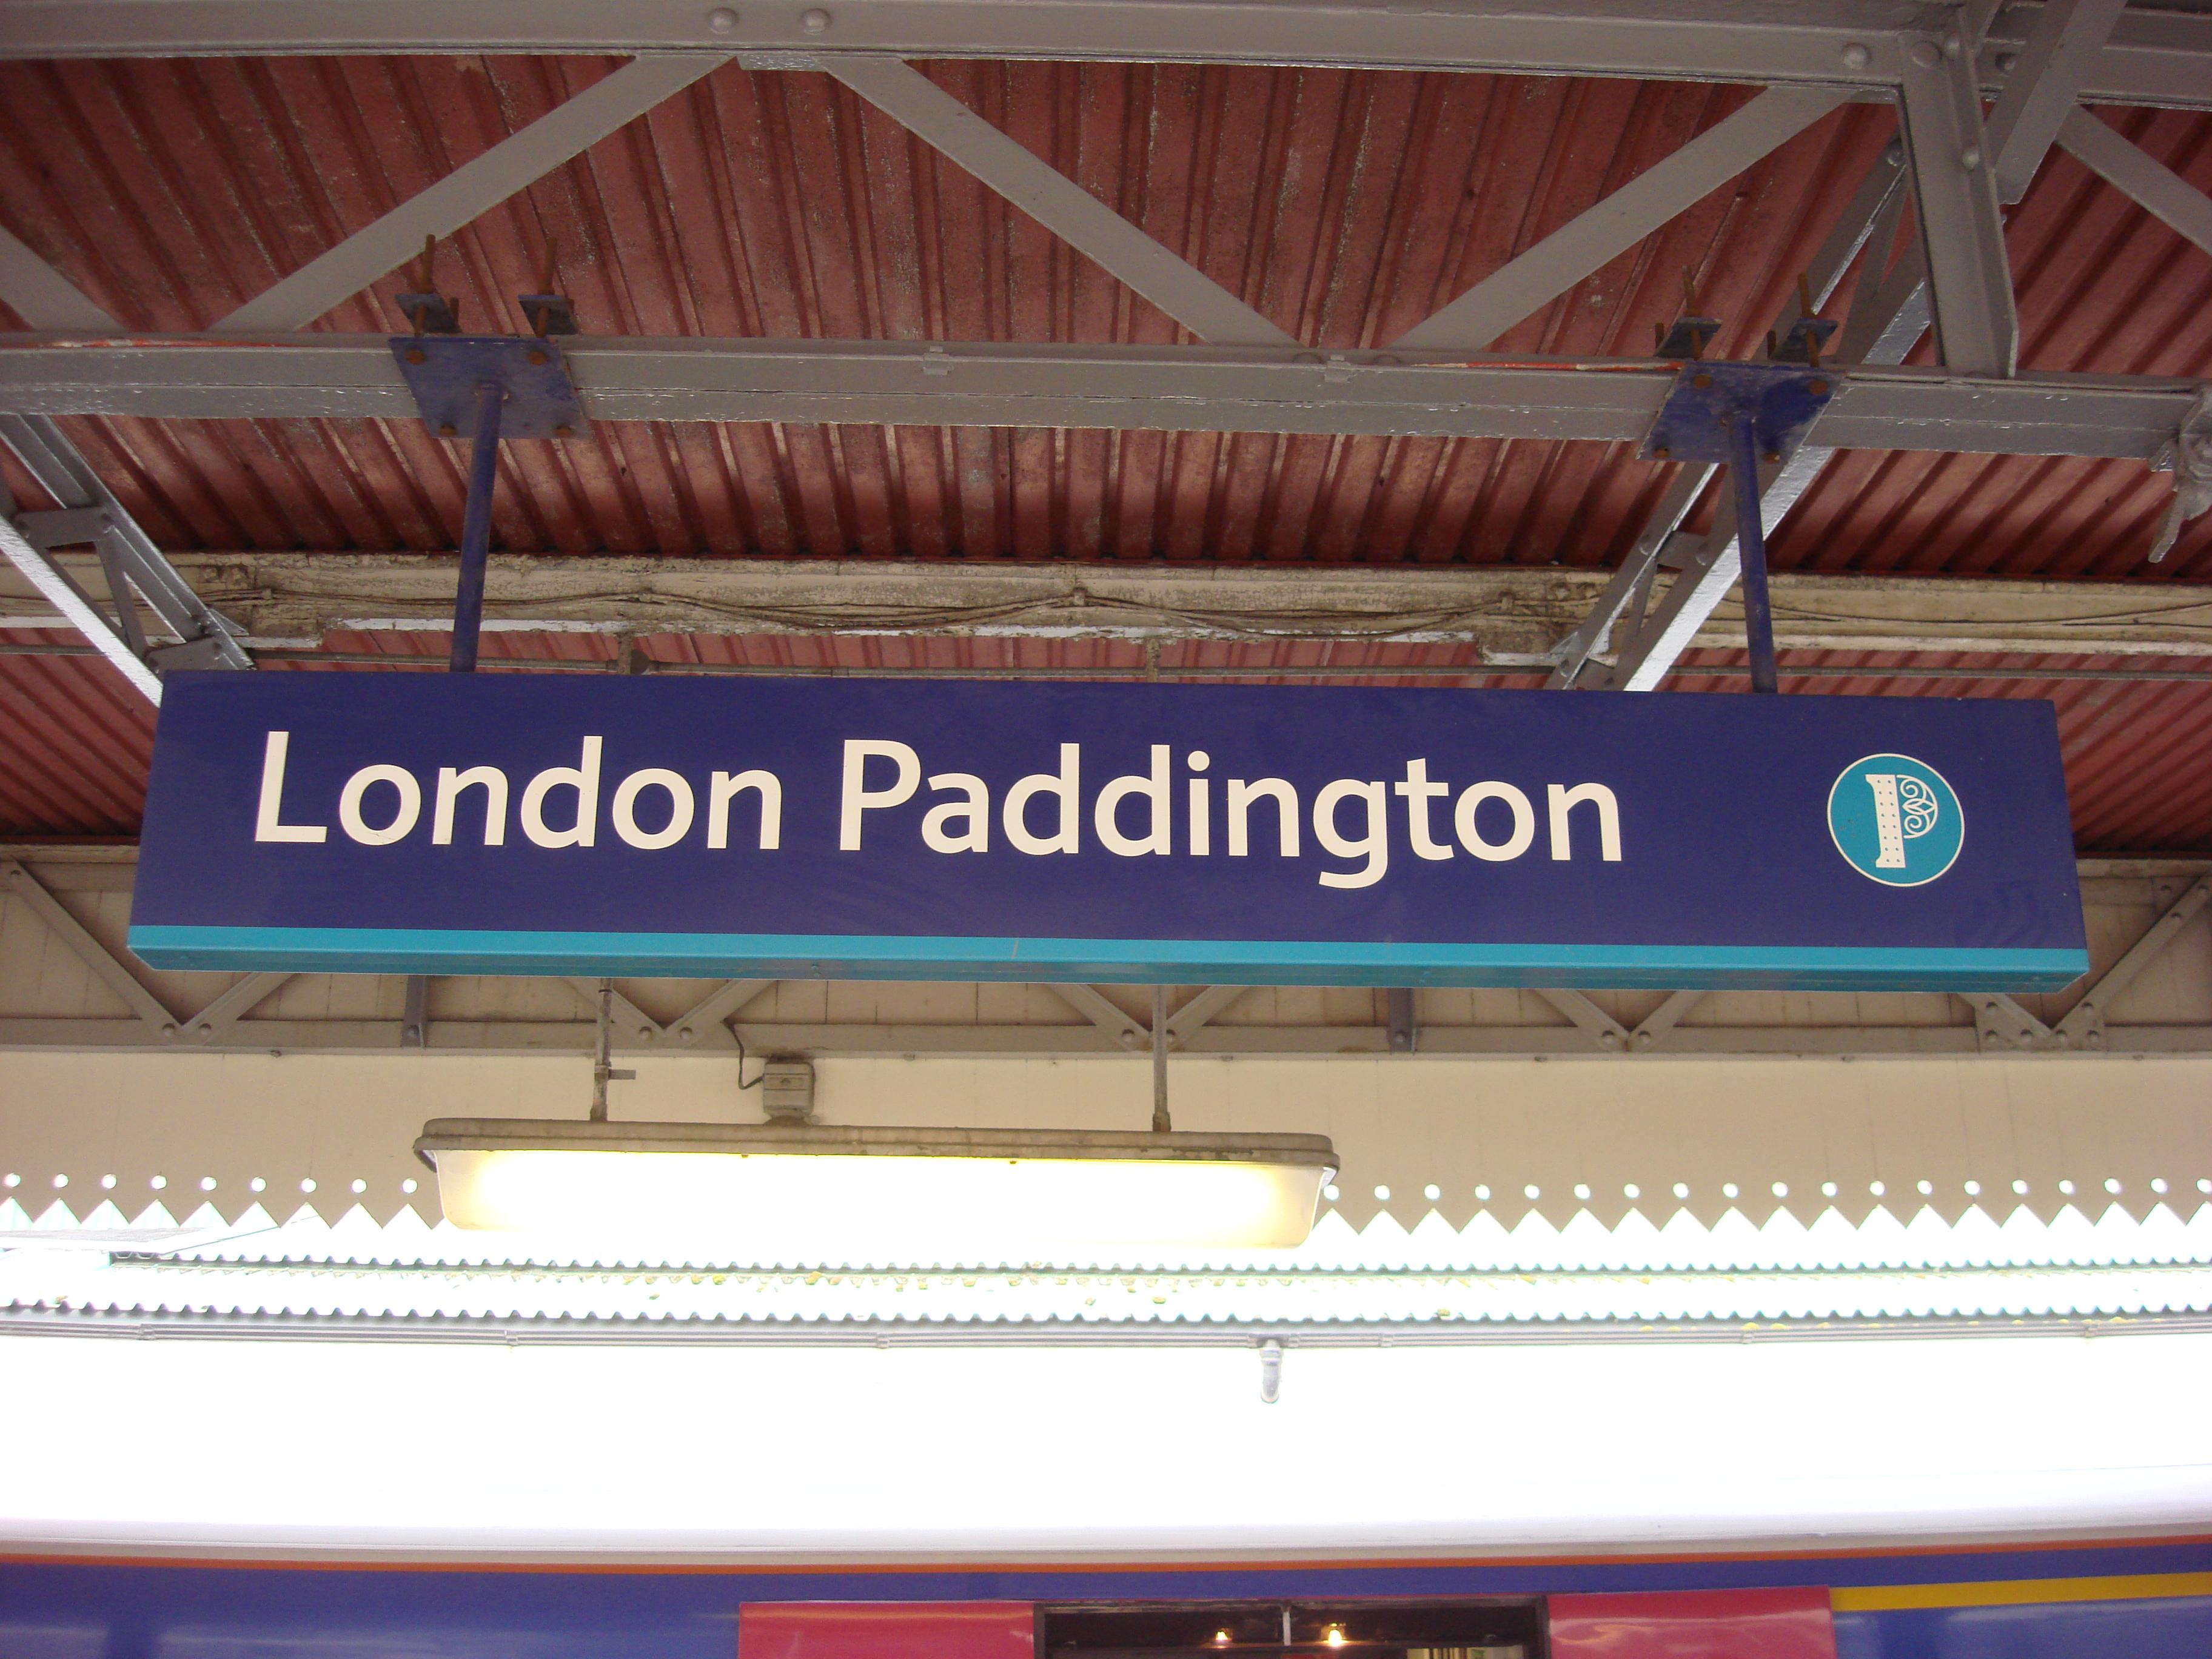 The London Paddington Dog Friendly